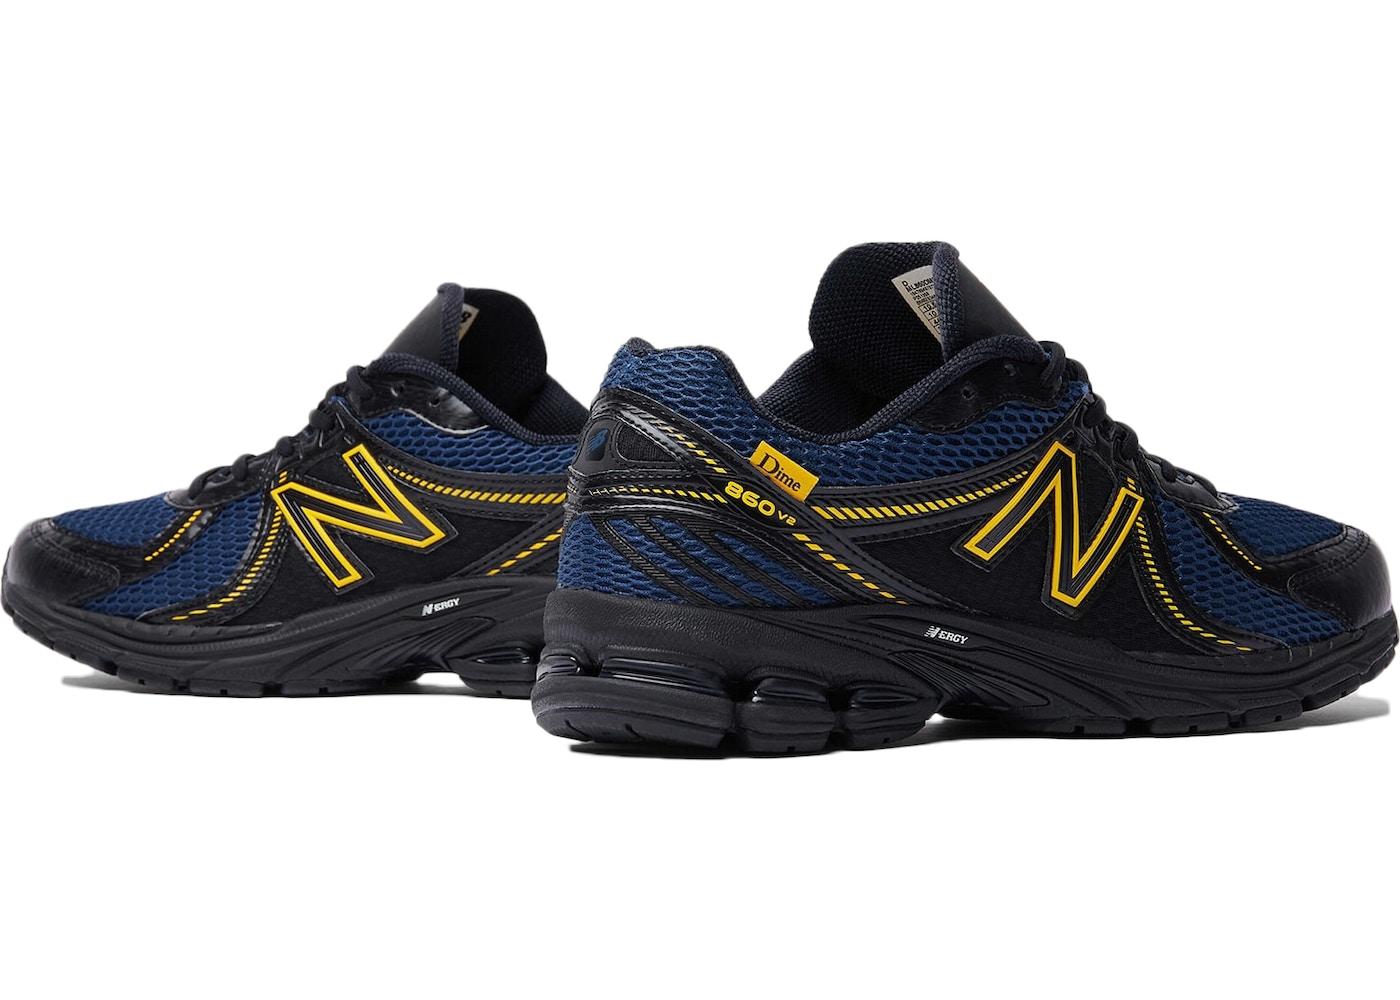 New Balance 860 V2 Dime Black